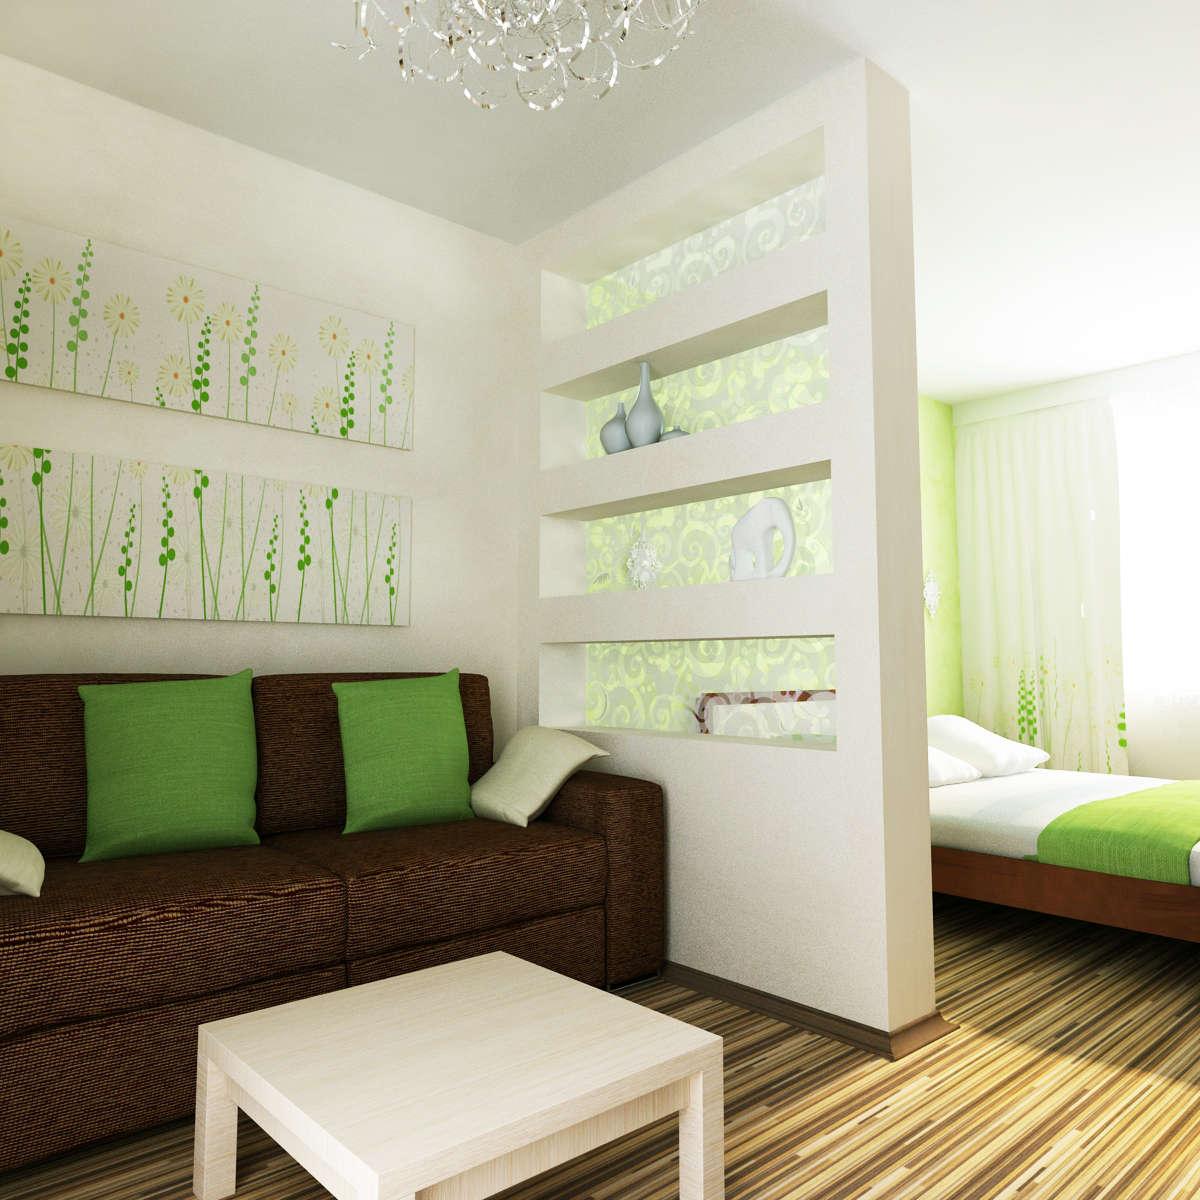 Дизайн комнаты 19 кв.м с ребенком 84